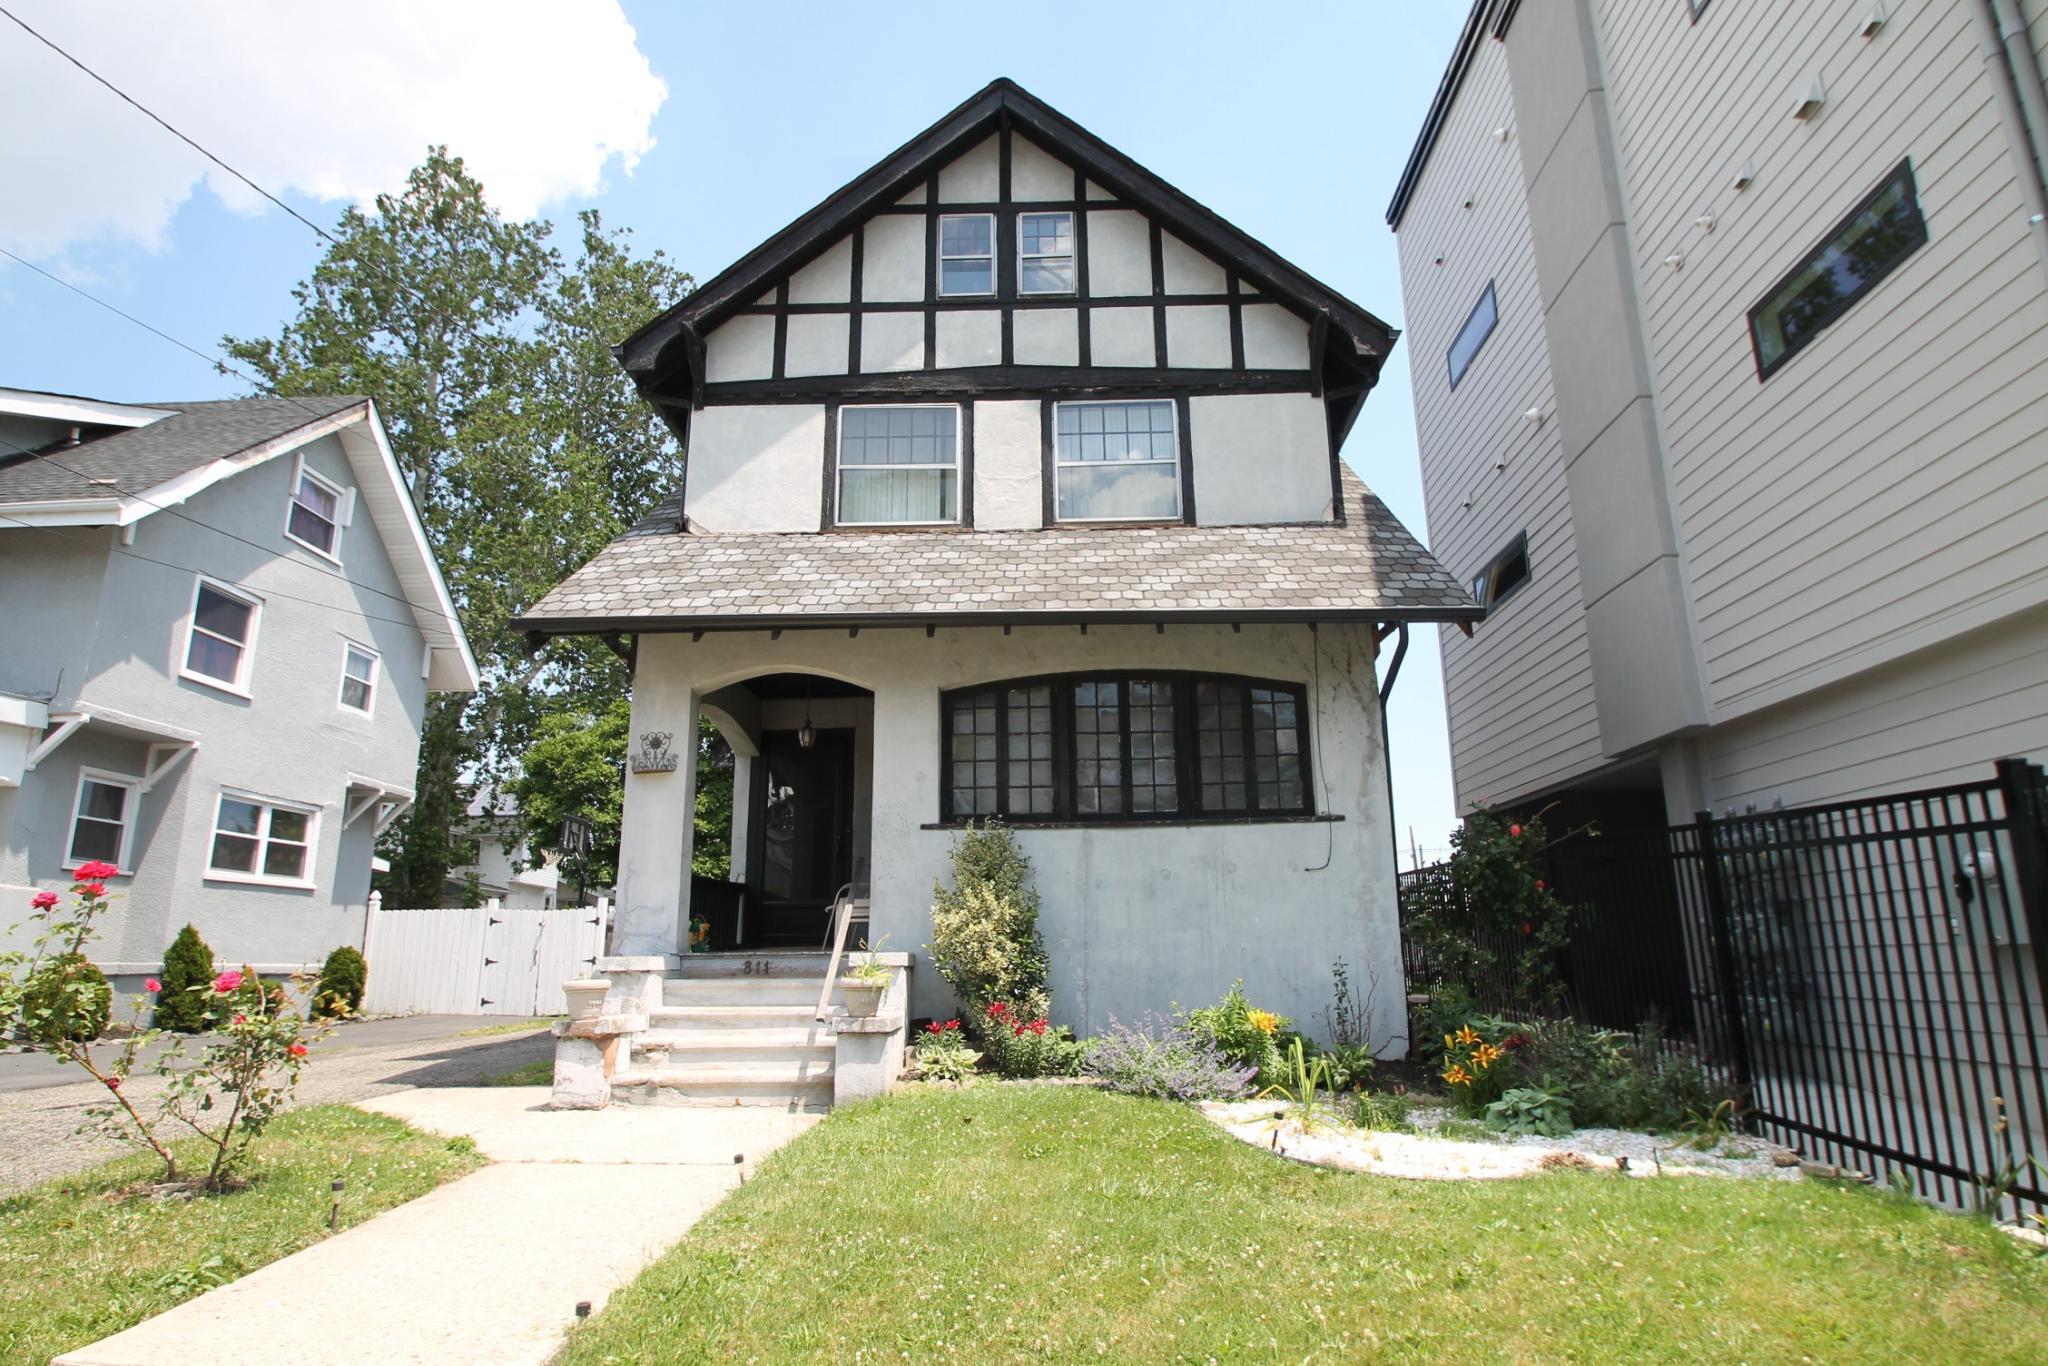 Permalink to Unique 3 Bedroom Apartments for Rent In Elizabeth Nj